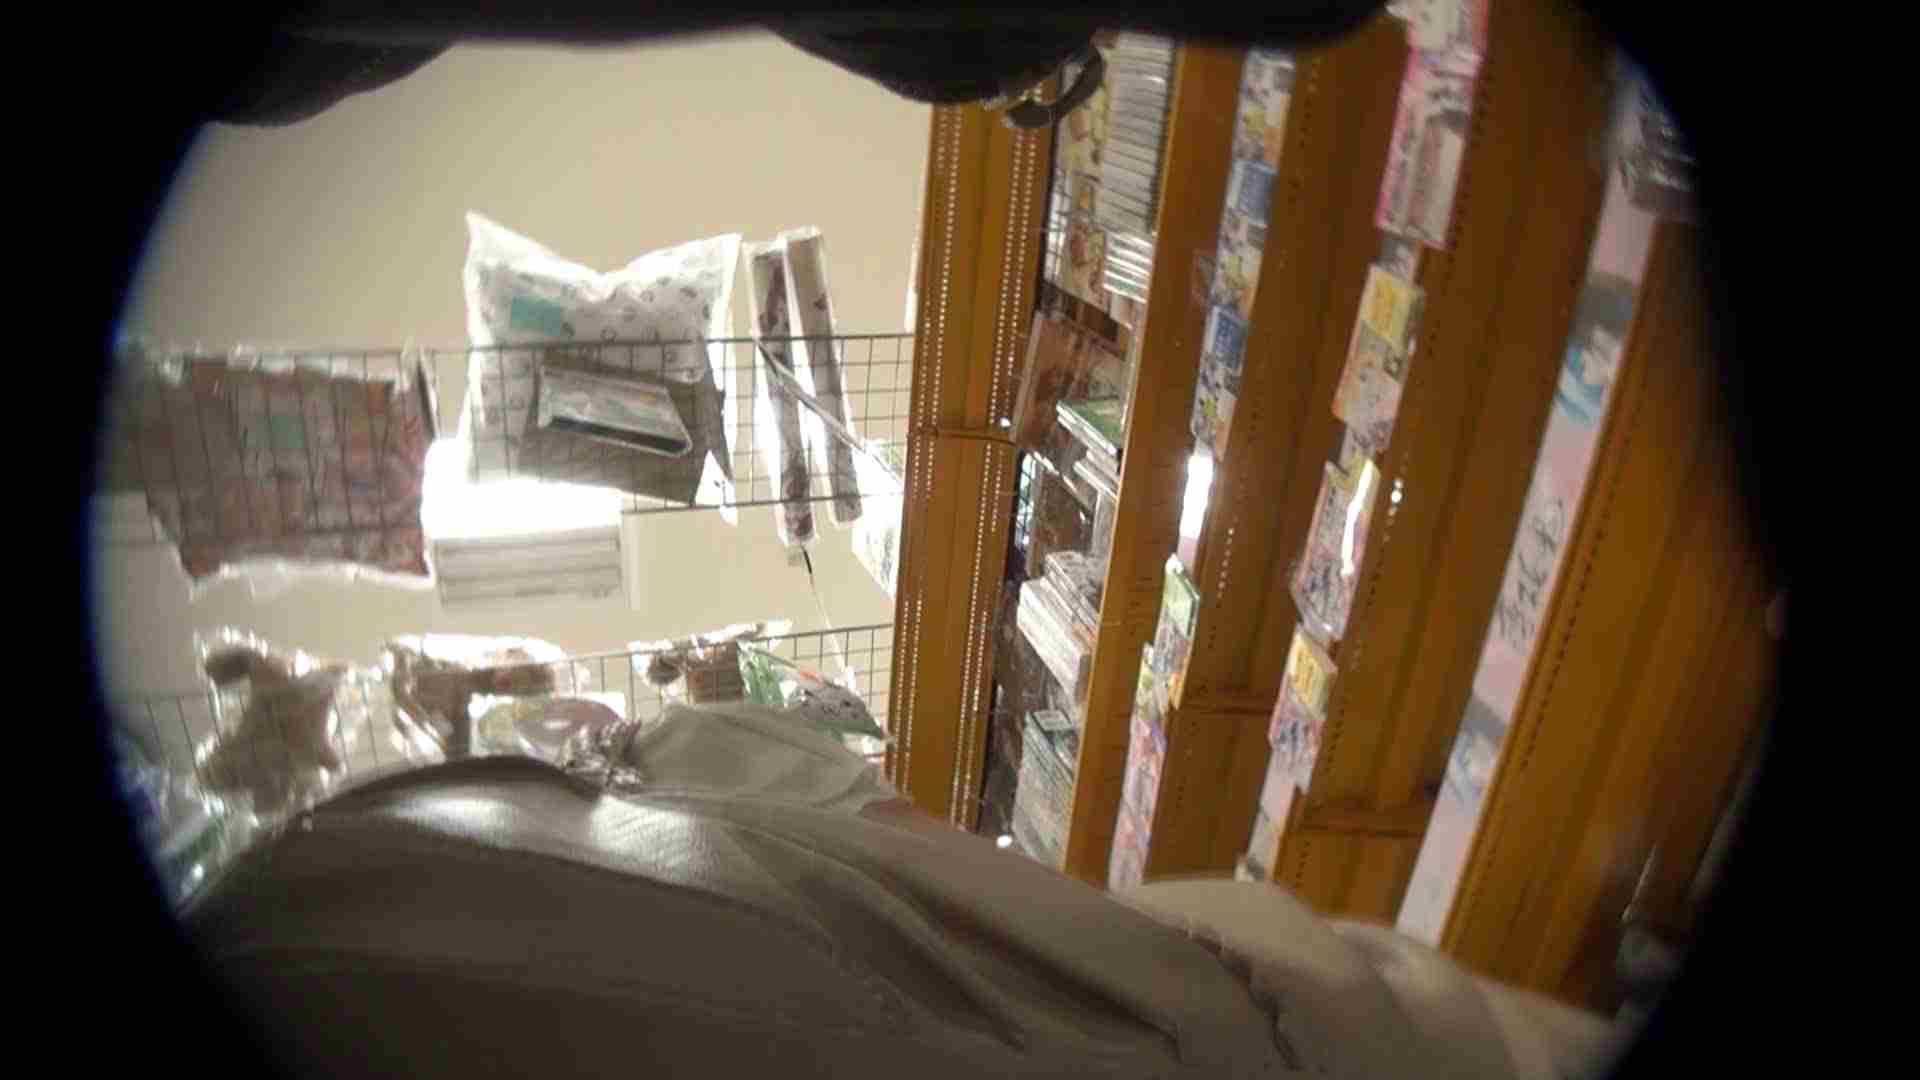 (FHD)ドリーム★アングルさんの逆さの極意 VOL.02 OLセックス 盗撮オメコ無修正動画無料 107画像 32